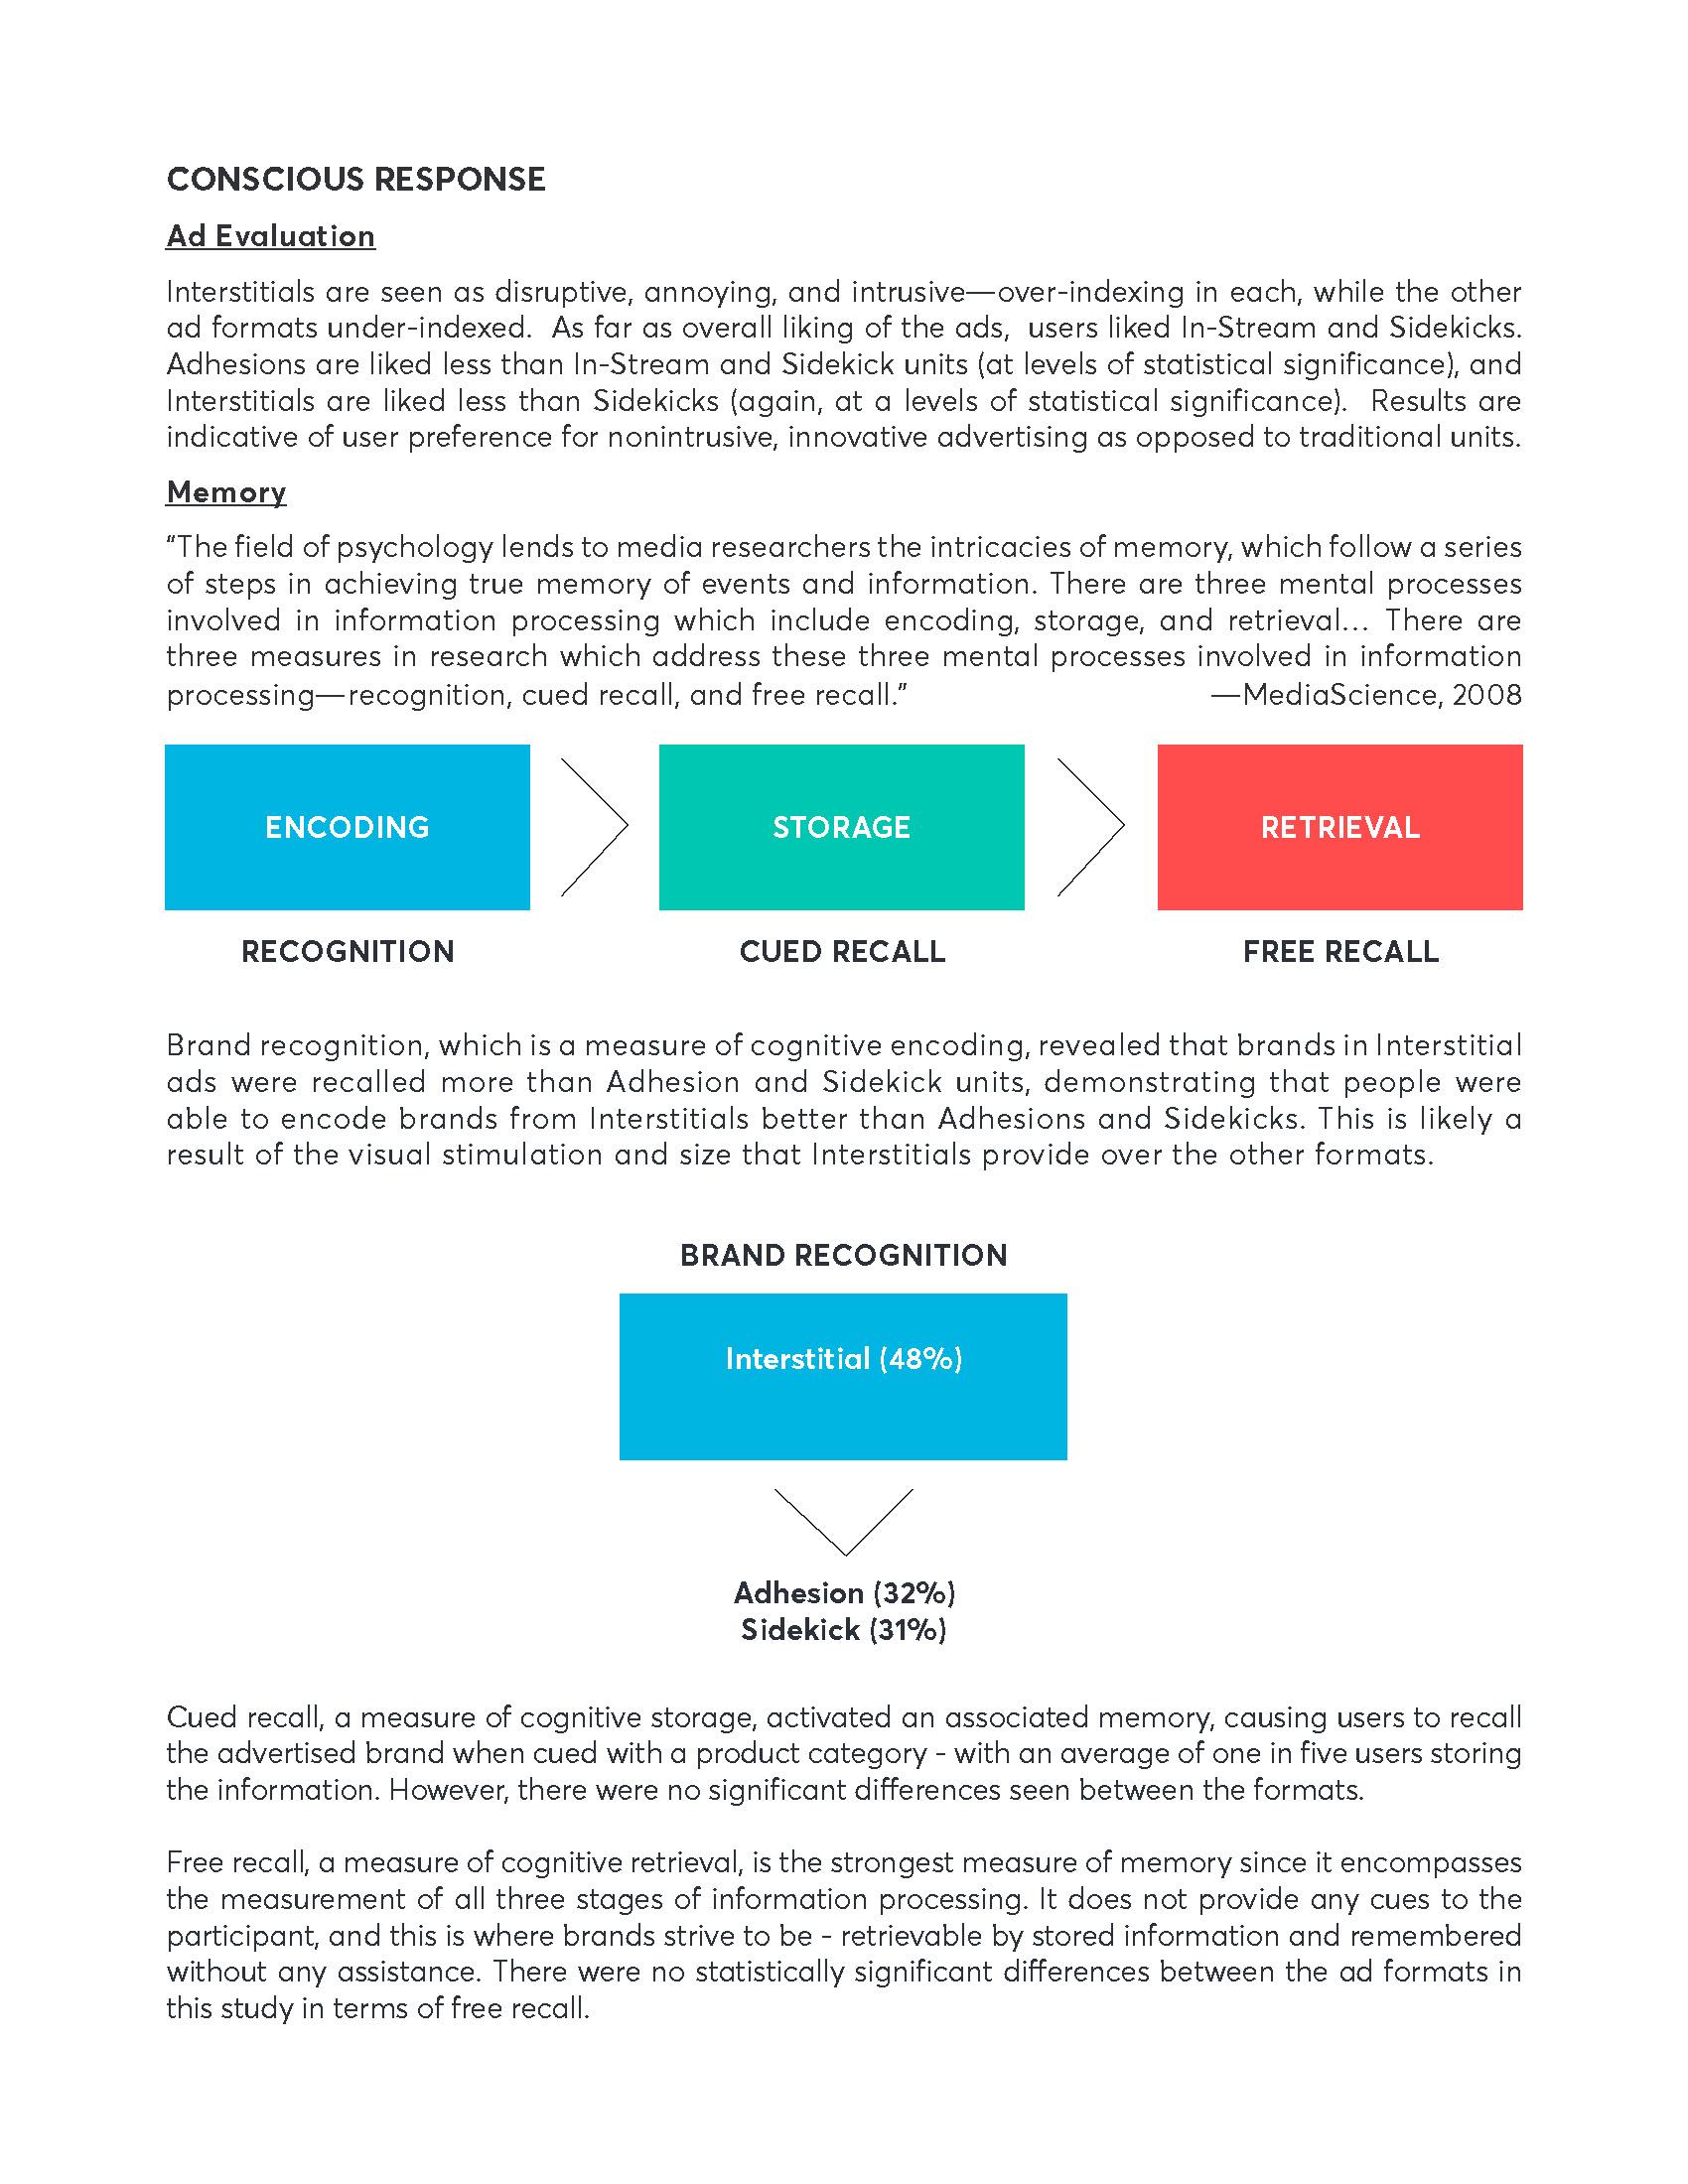 Captivate vs Aggravate Study_Page_10.jpg